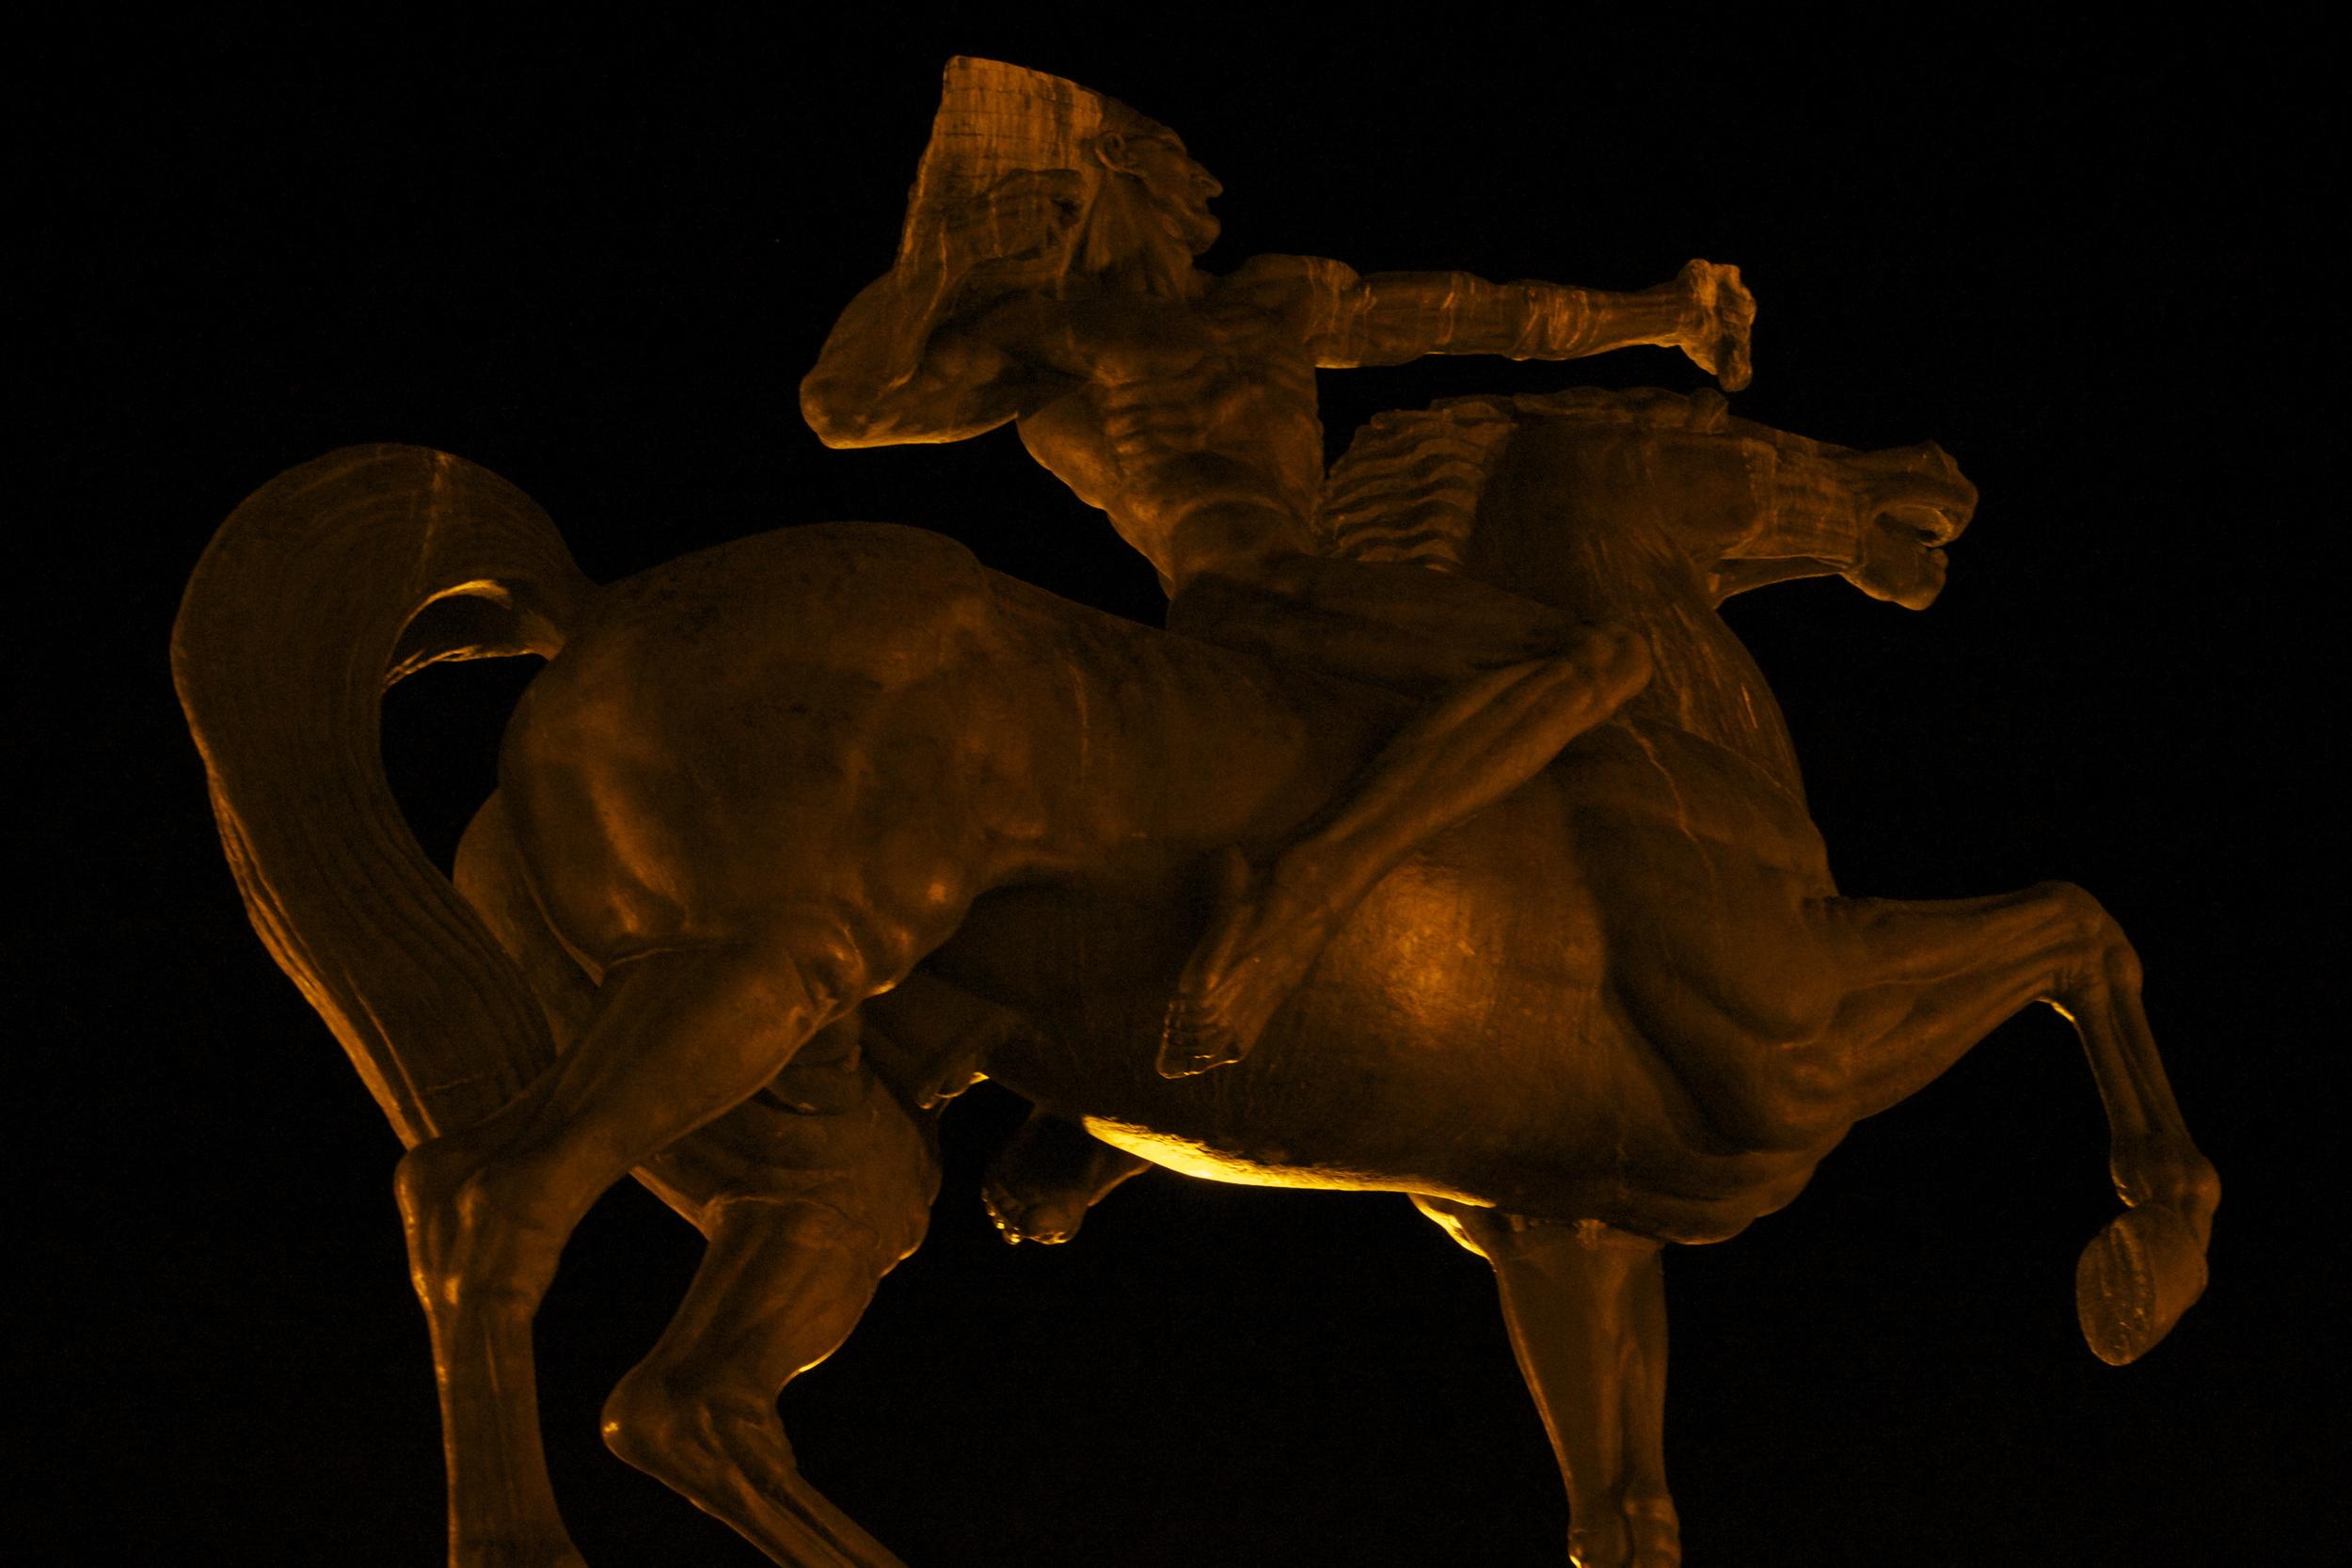 Night Horse